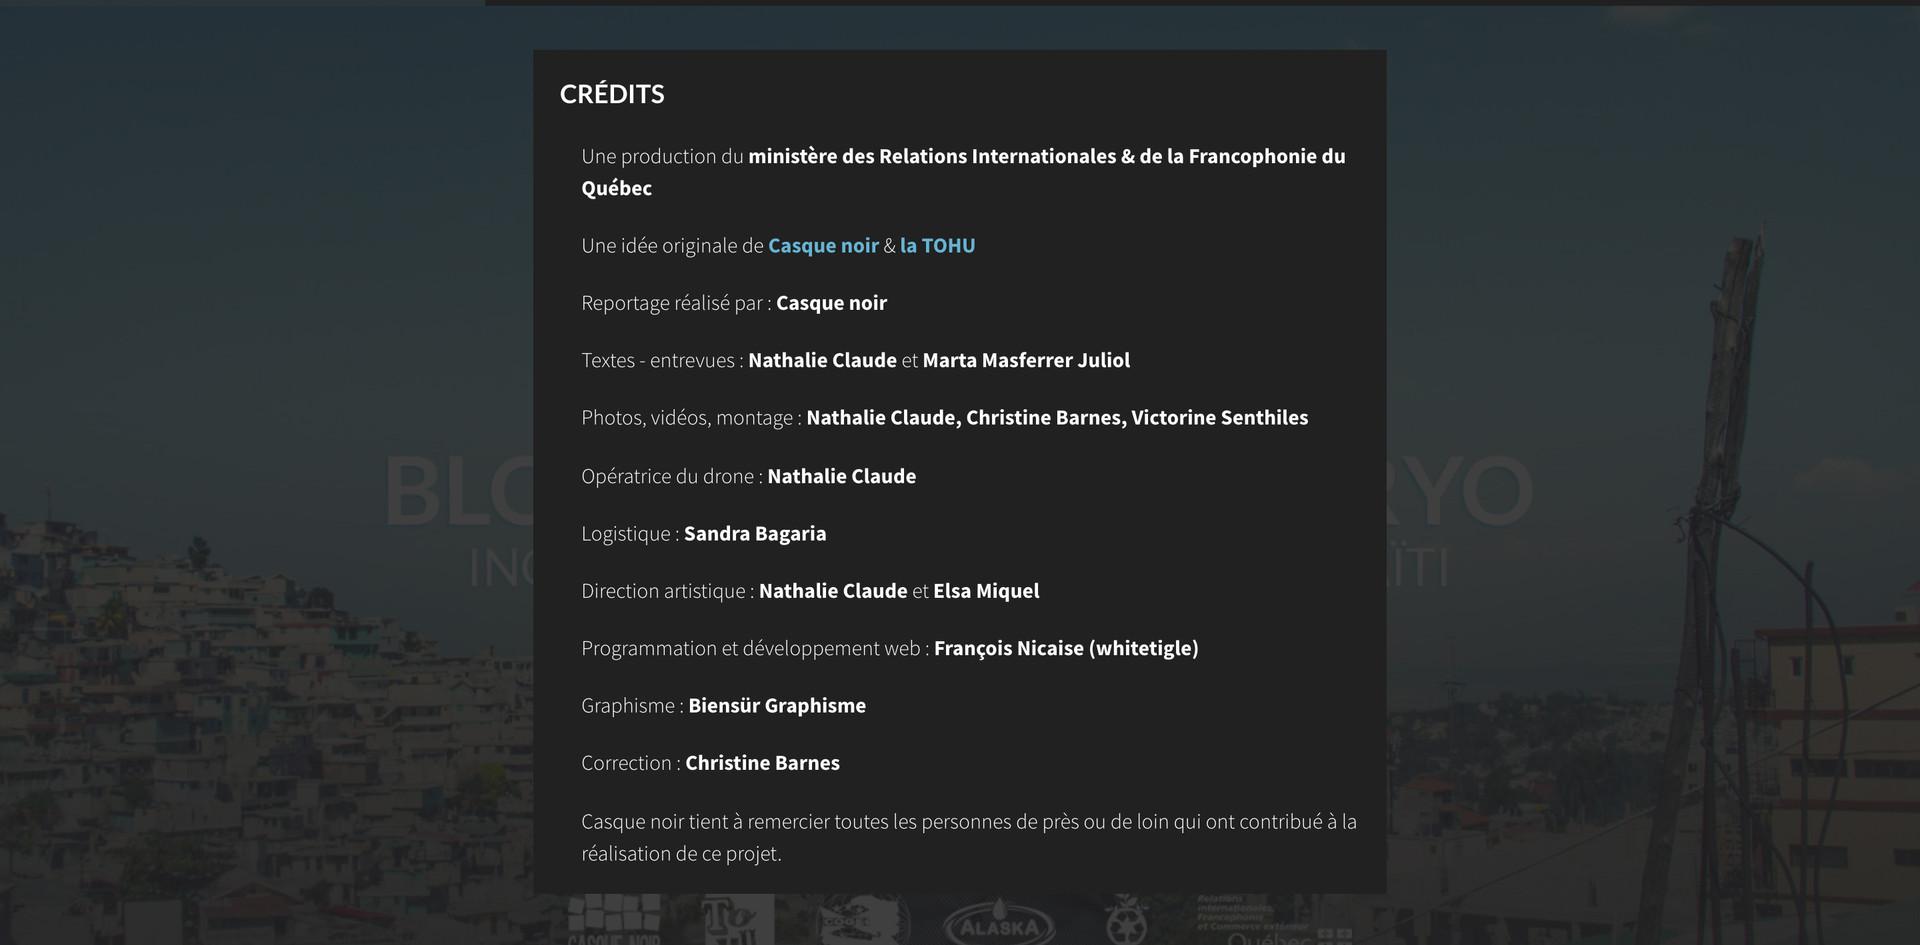 CNWD_devices_4_credits.jpg